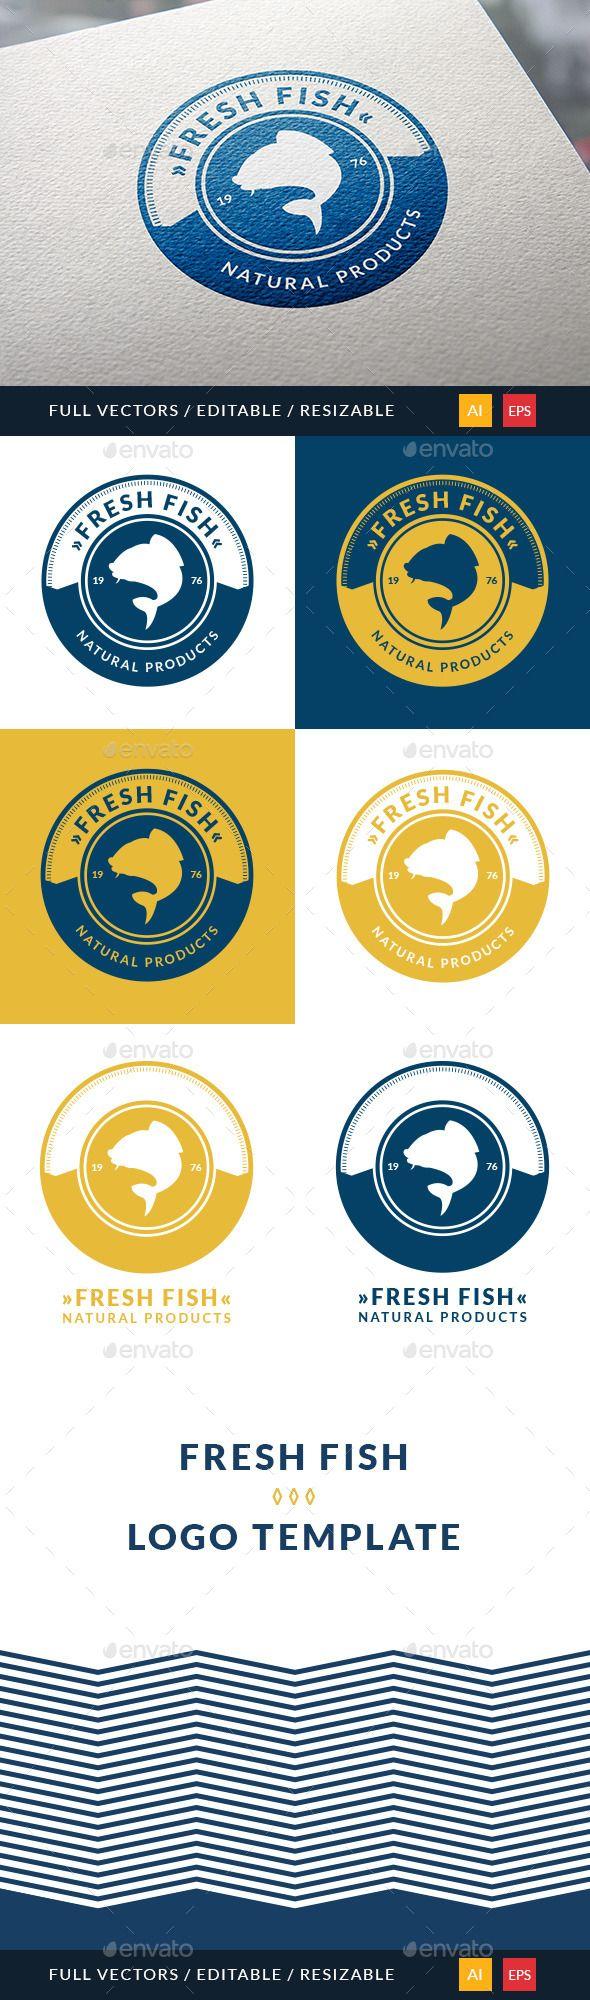 Fresh Fish Logo — Vector EPS #shark #sailfish • Available here → https://graphicriver.net/item/fresh-fish-logo/10484027?ref=pxcr